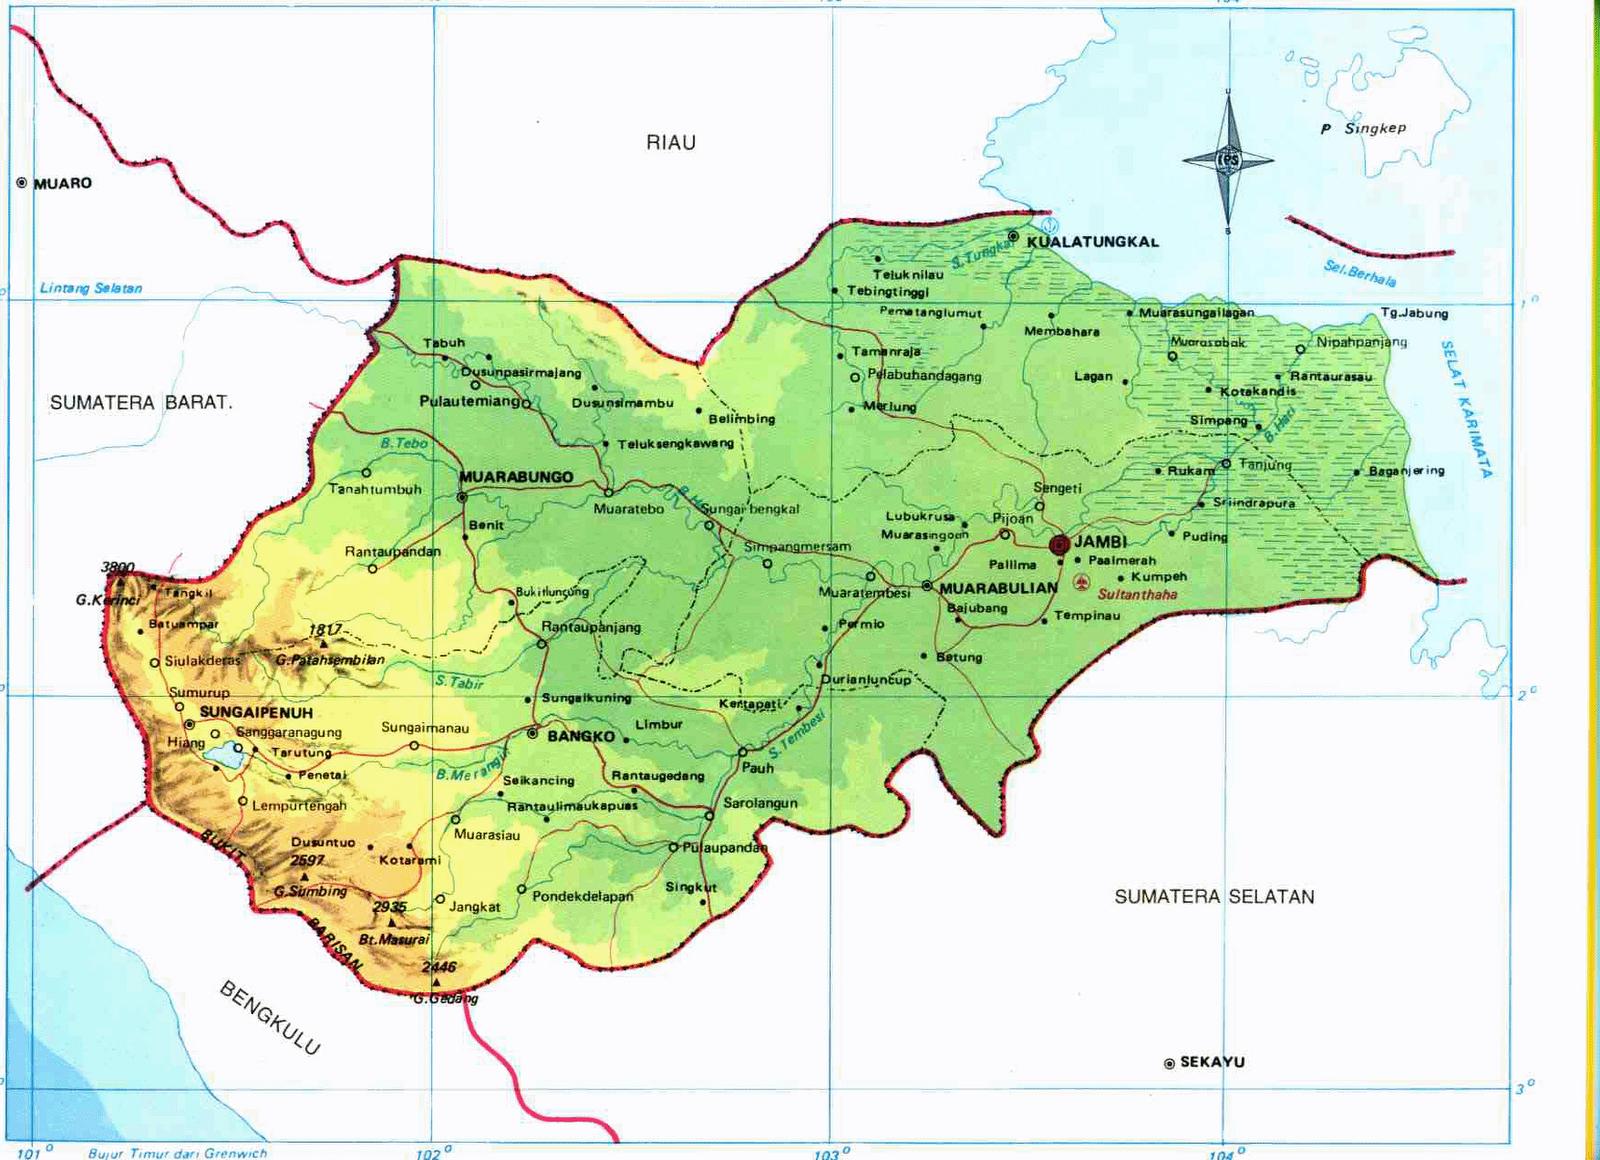 Peta Lengkap Indonesia June 2015